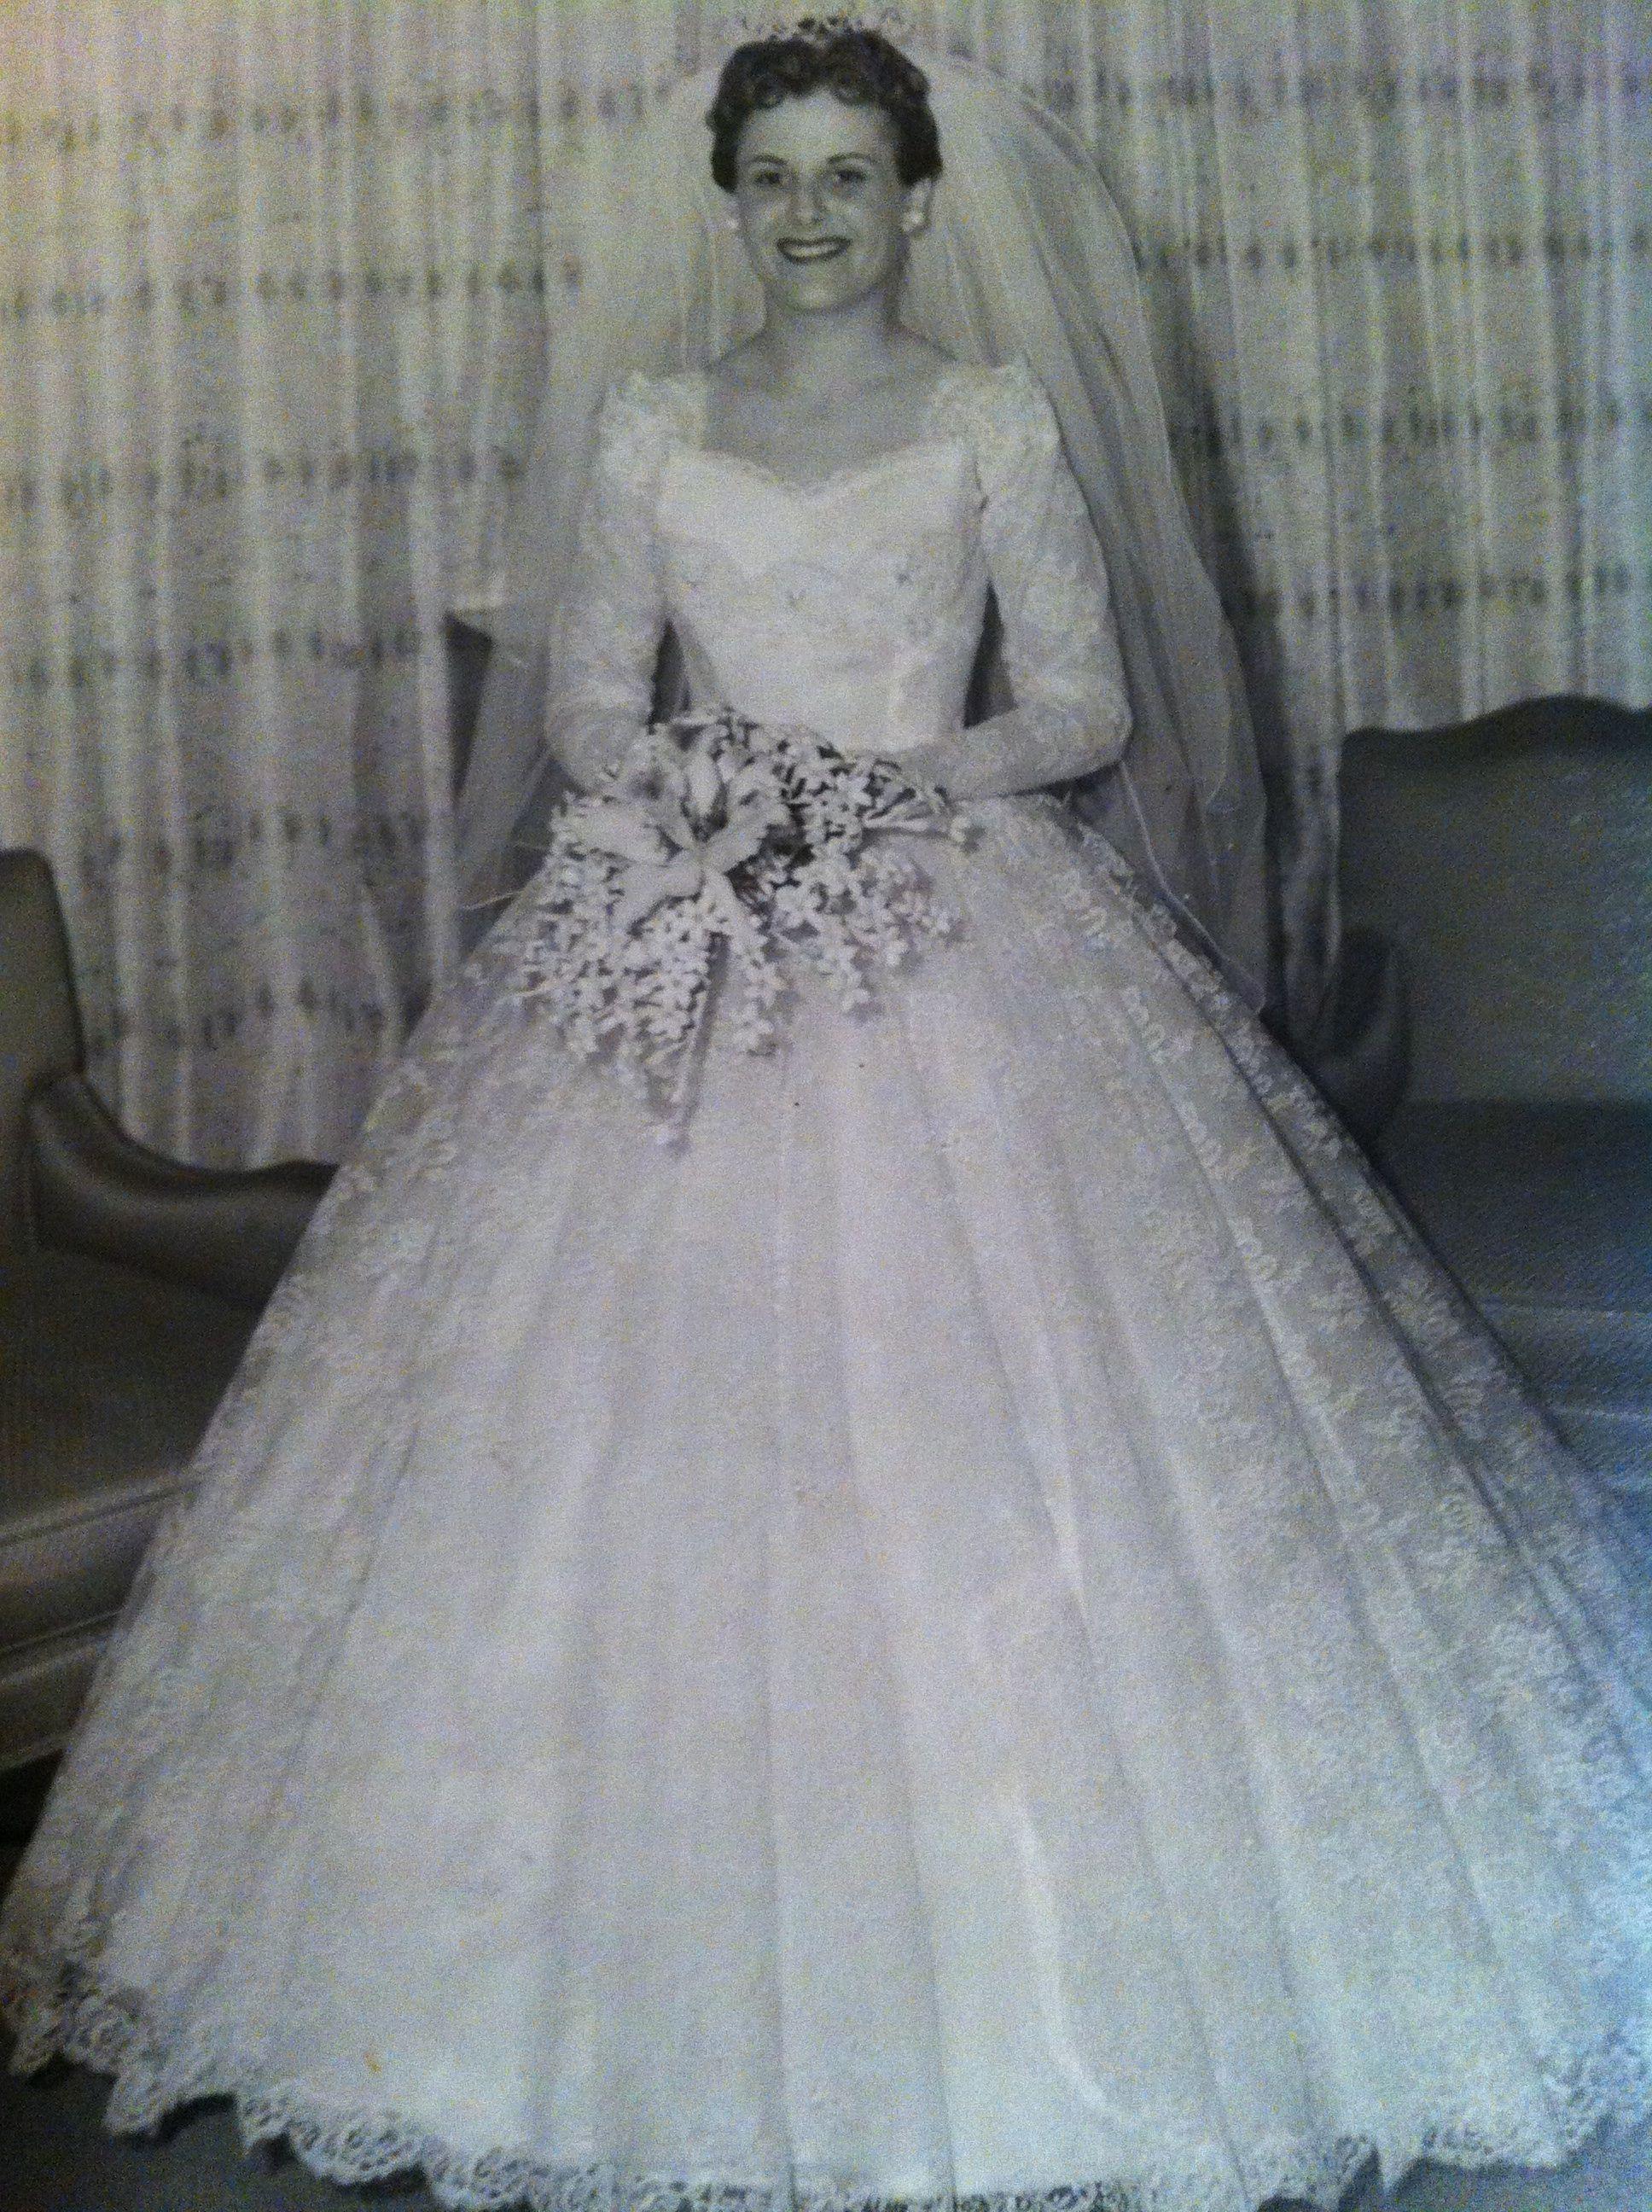 My grandmother 39 s wedding dress marry me pinterest for Marry me wedding dresses